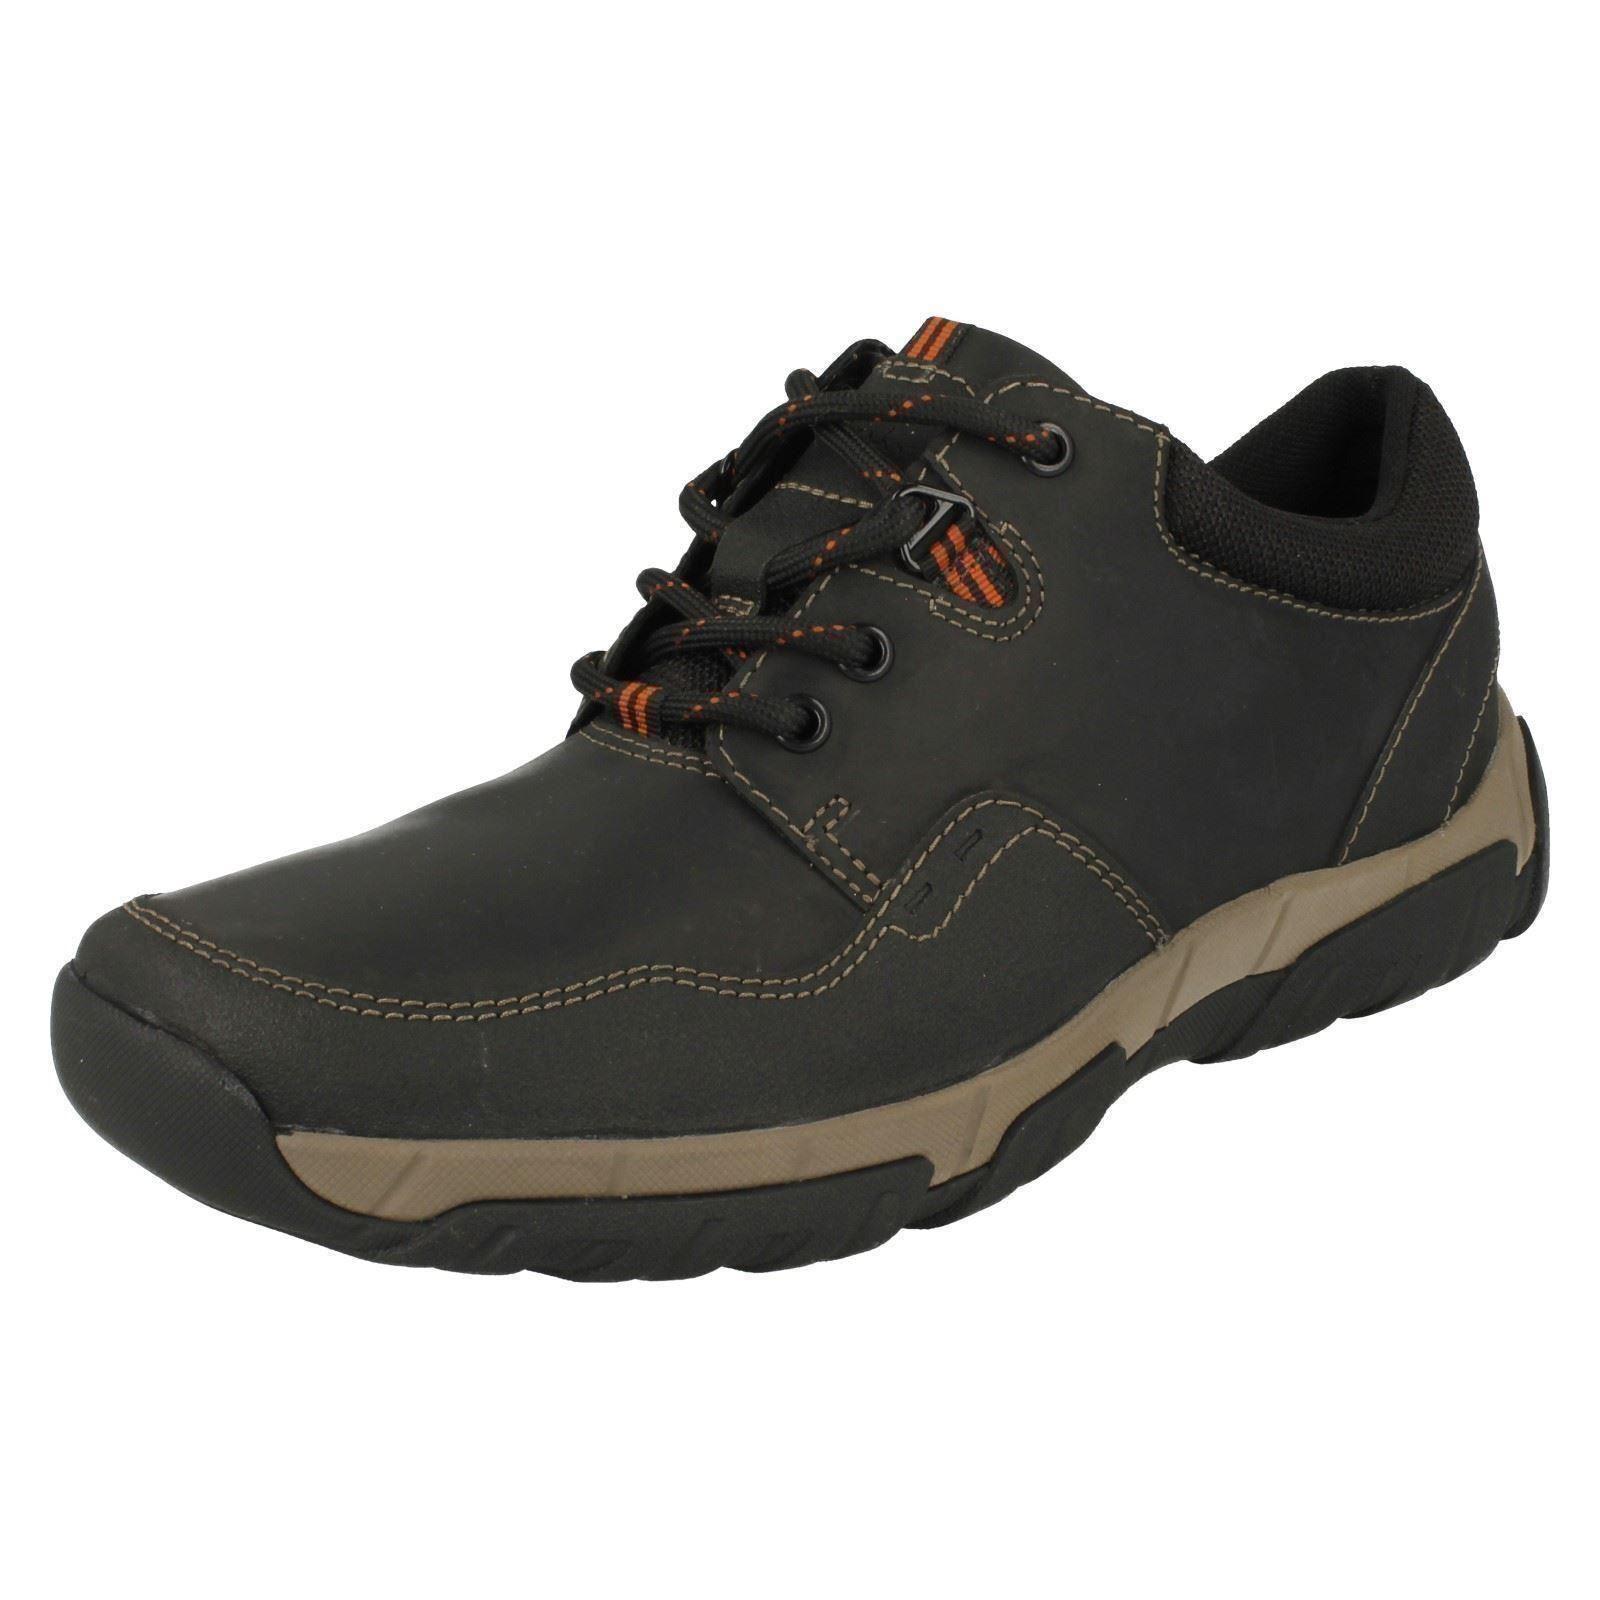 Clarks 'Walbeck Edge' Herren Schwarze Leder-schnürschuhe wasserfeste Schuhe